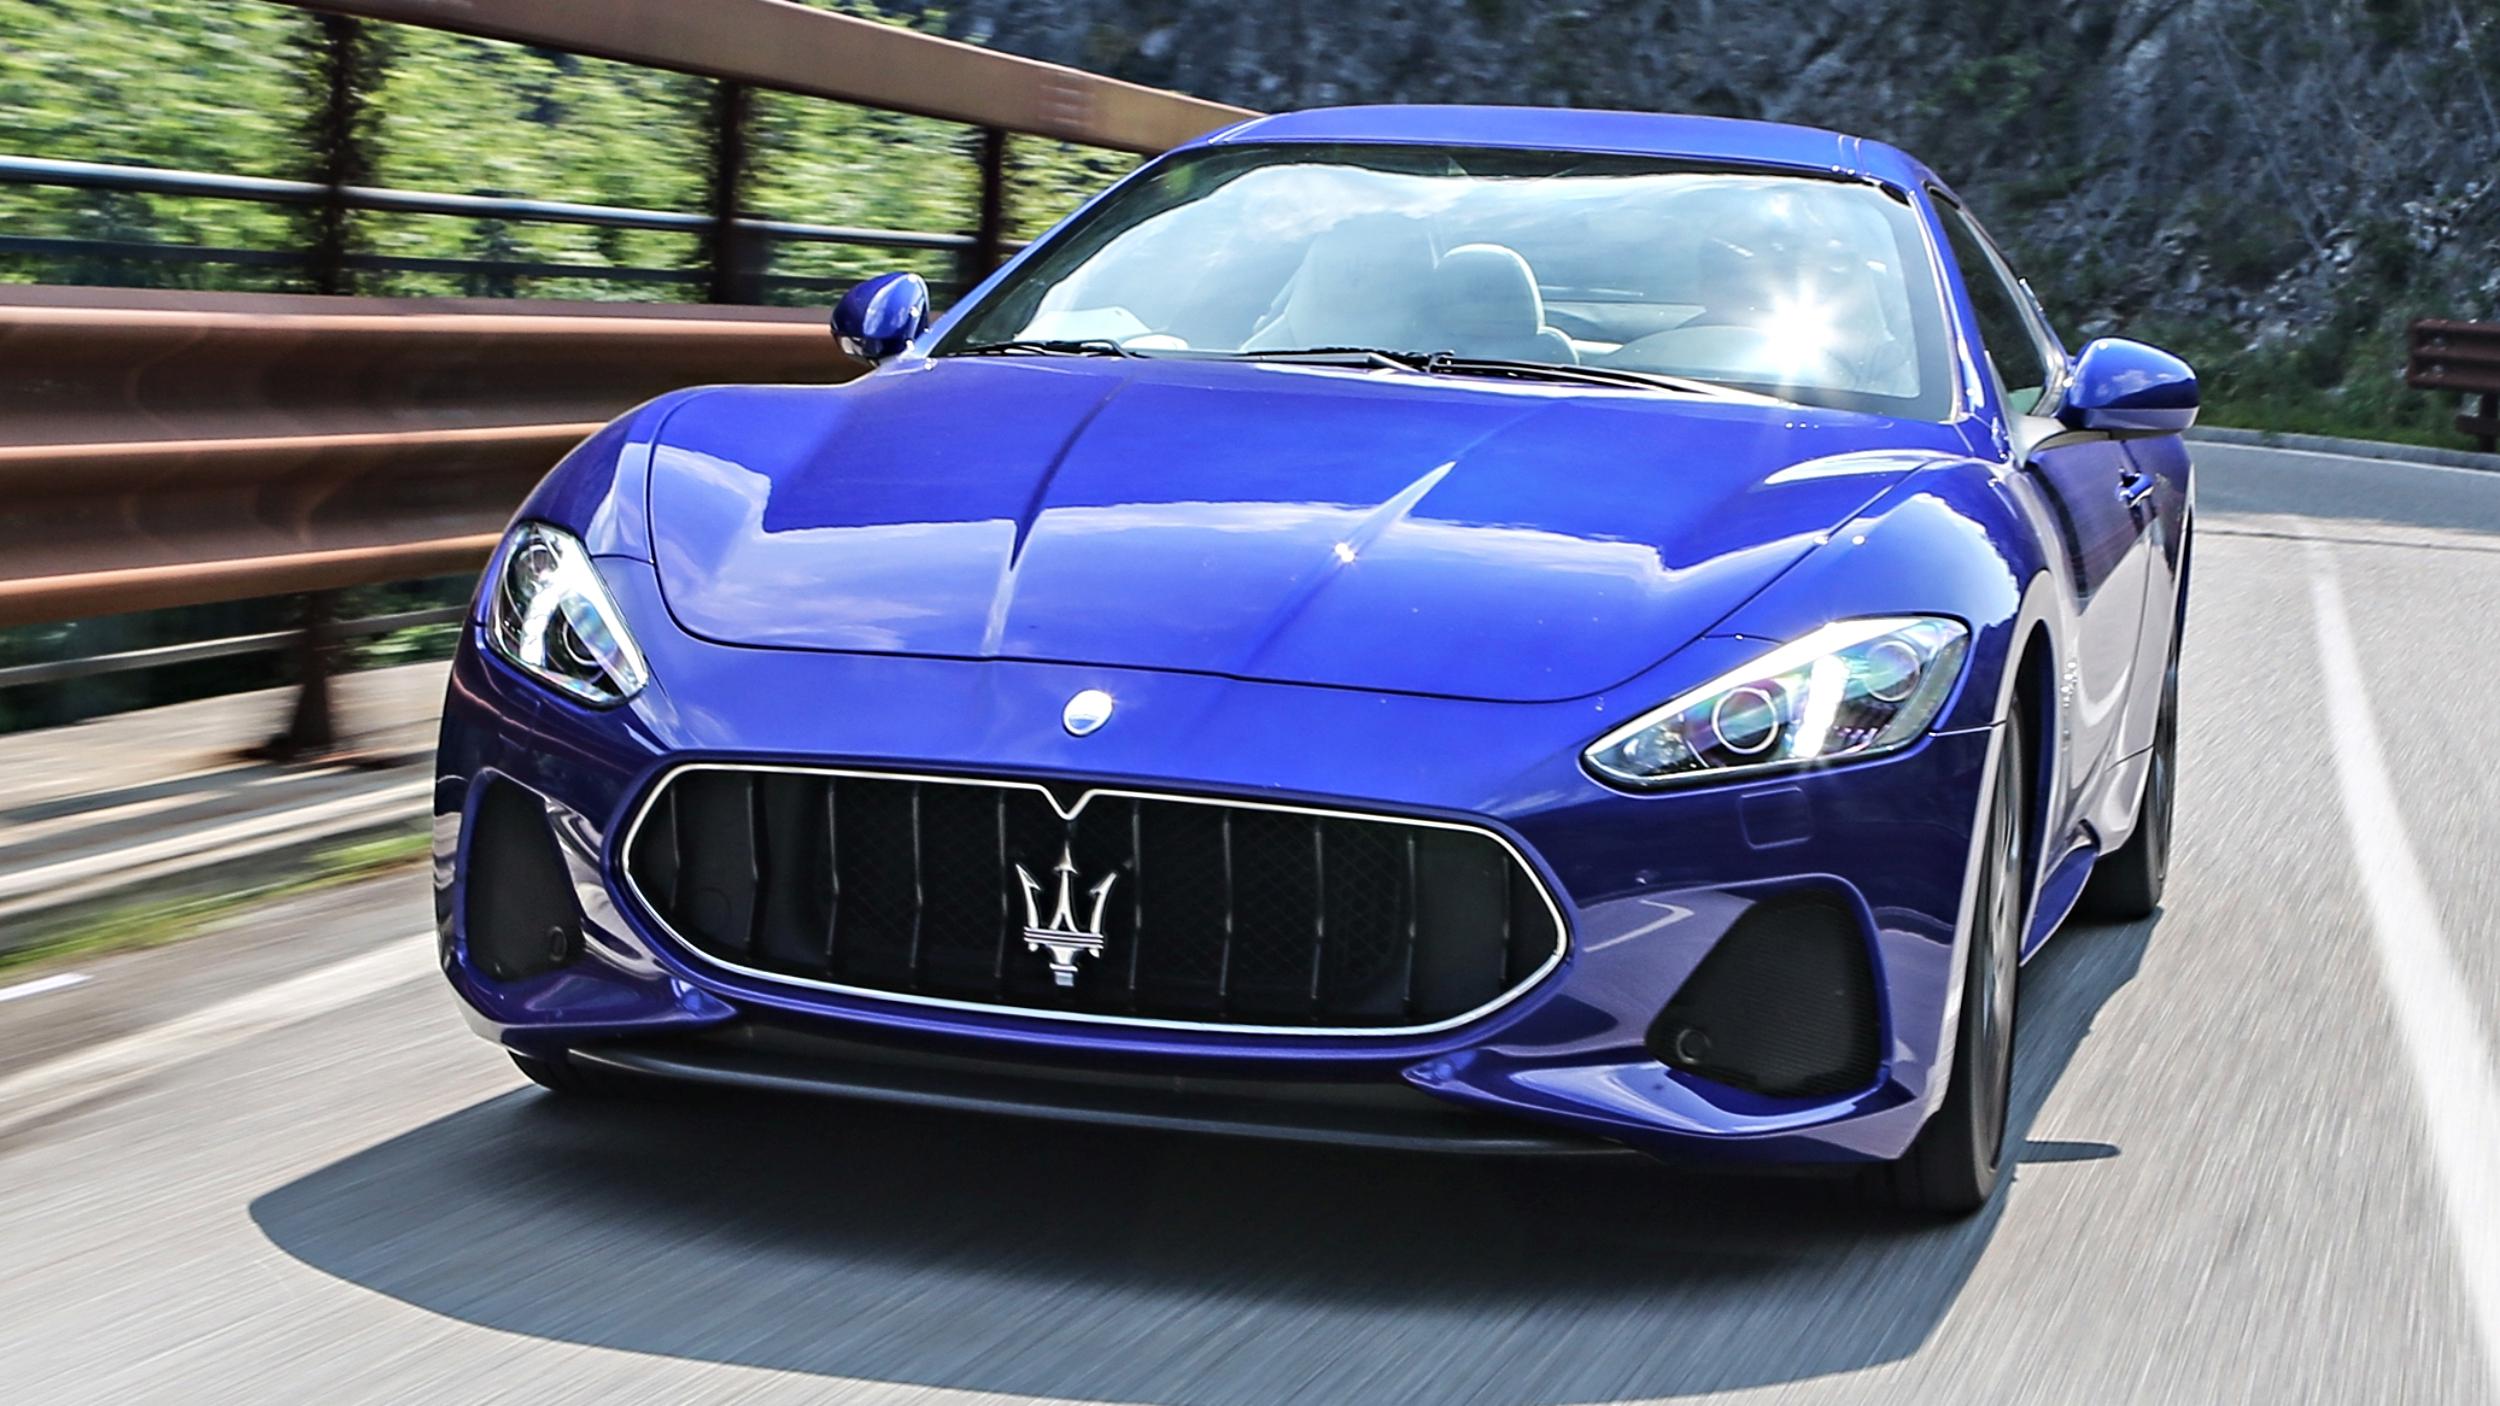 News Maserati Confirms Alfieri Sports Car And New Suv